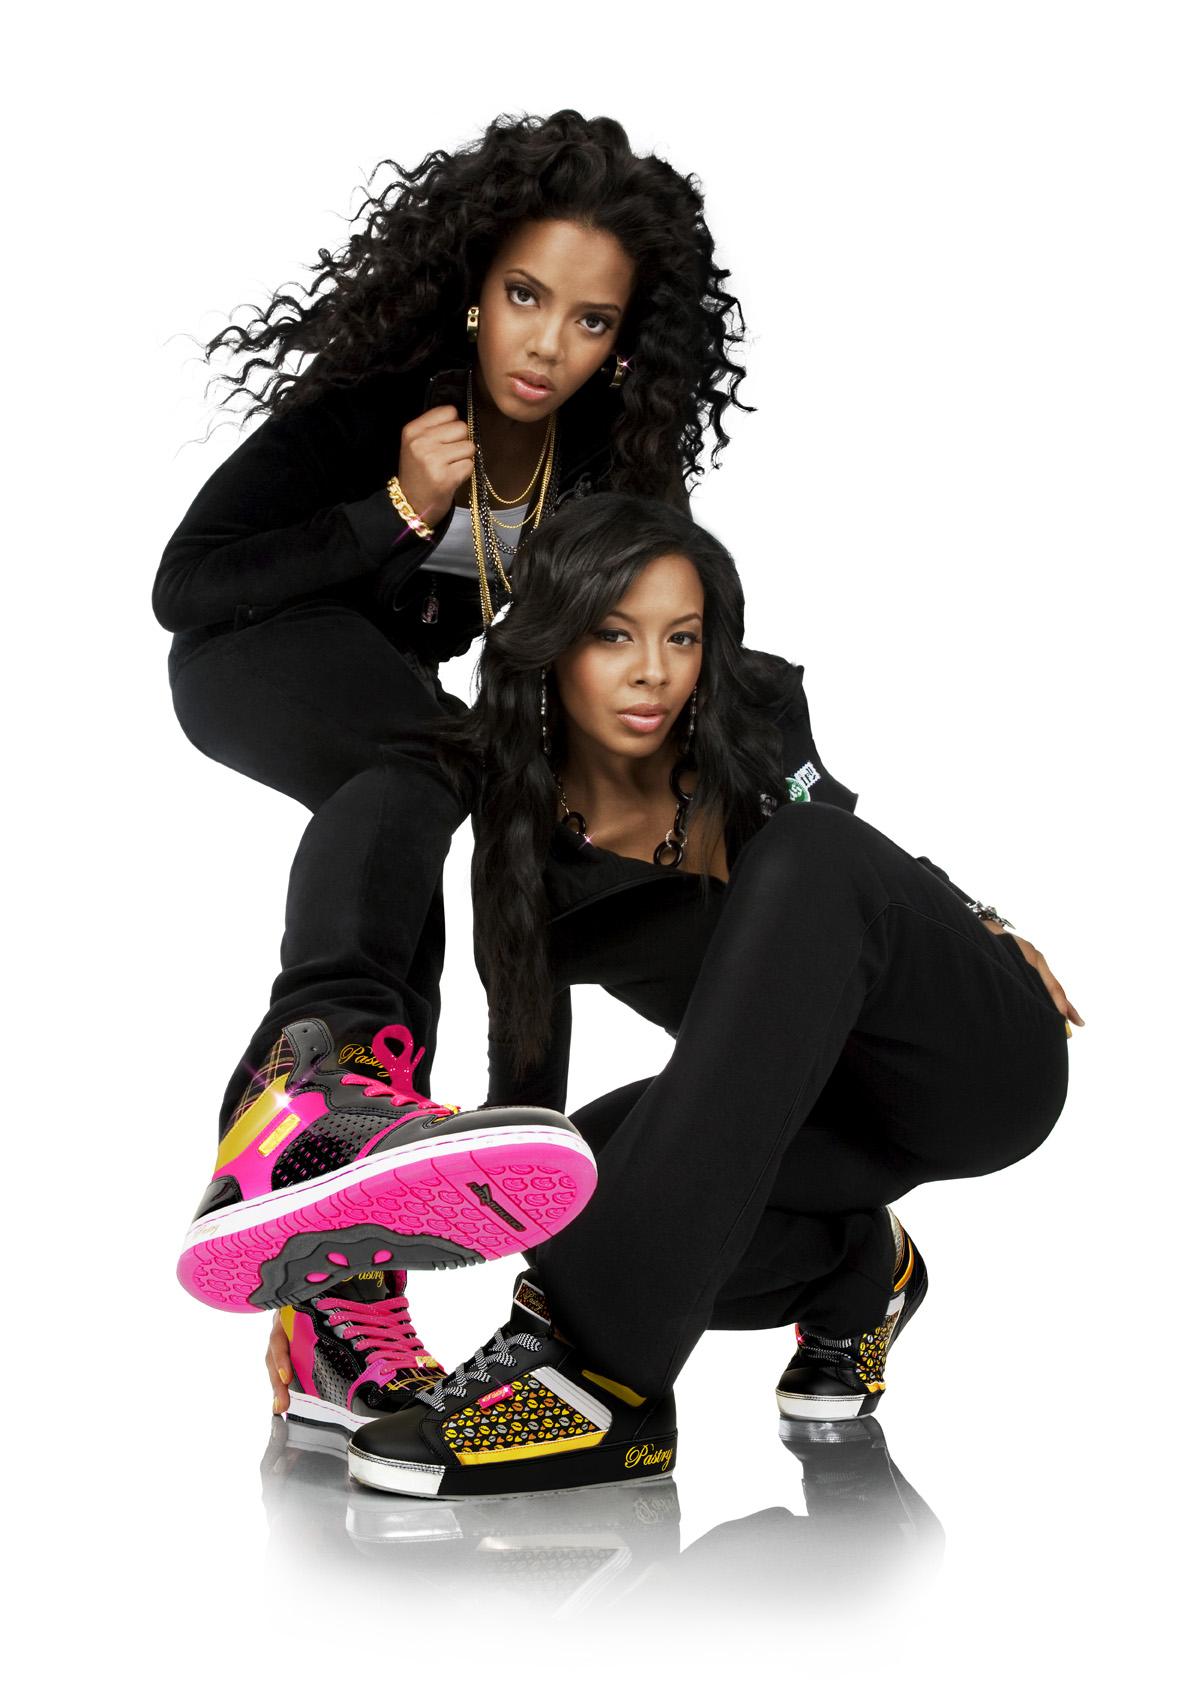 Hip hop fashion - Wikipedia 70